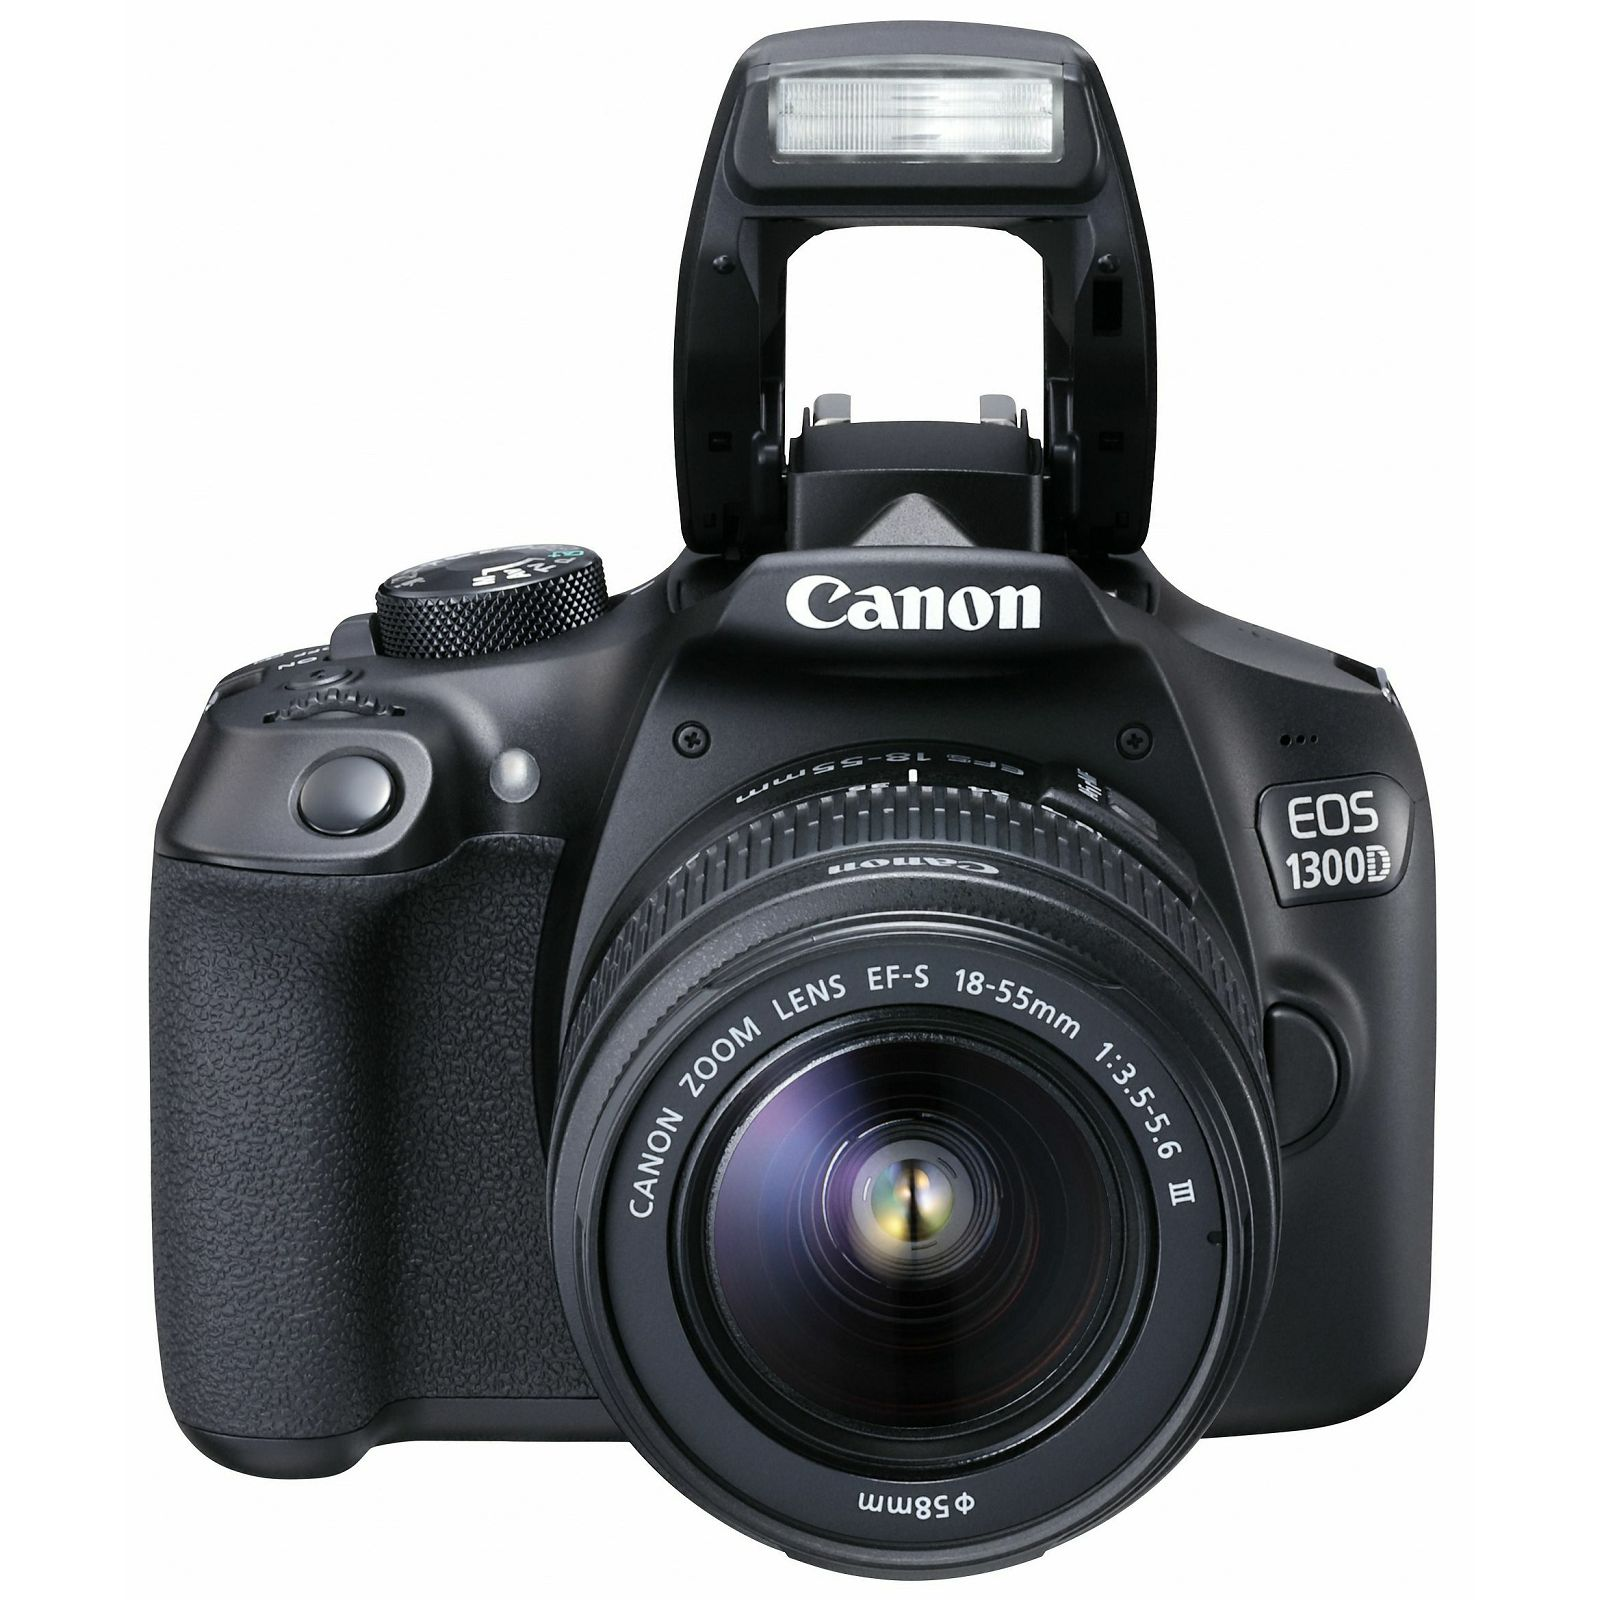 Canon EOS 1300D 18-55 DC III DSLR Digitalni fotoaparat + objektiv 18-55 F3.5-5.6 (AC1160C009AA)